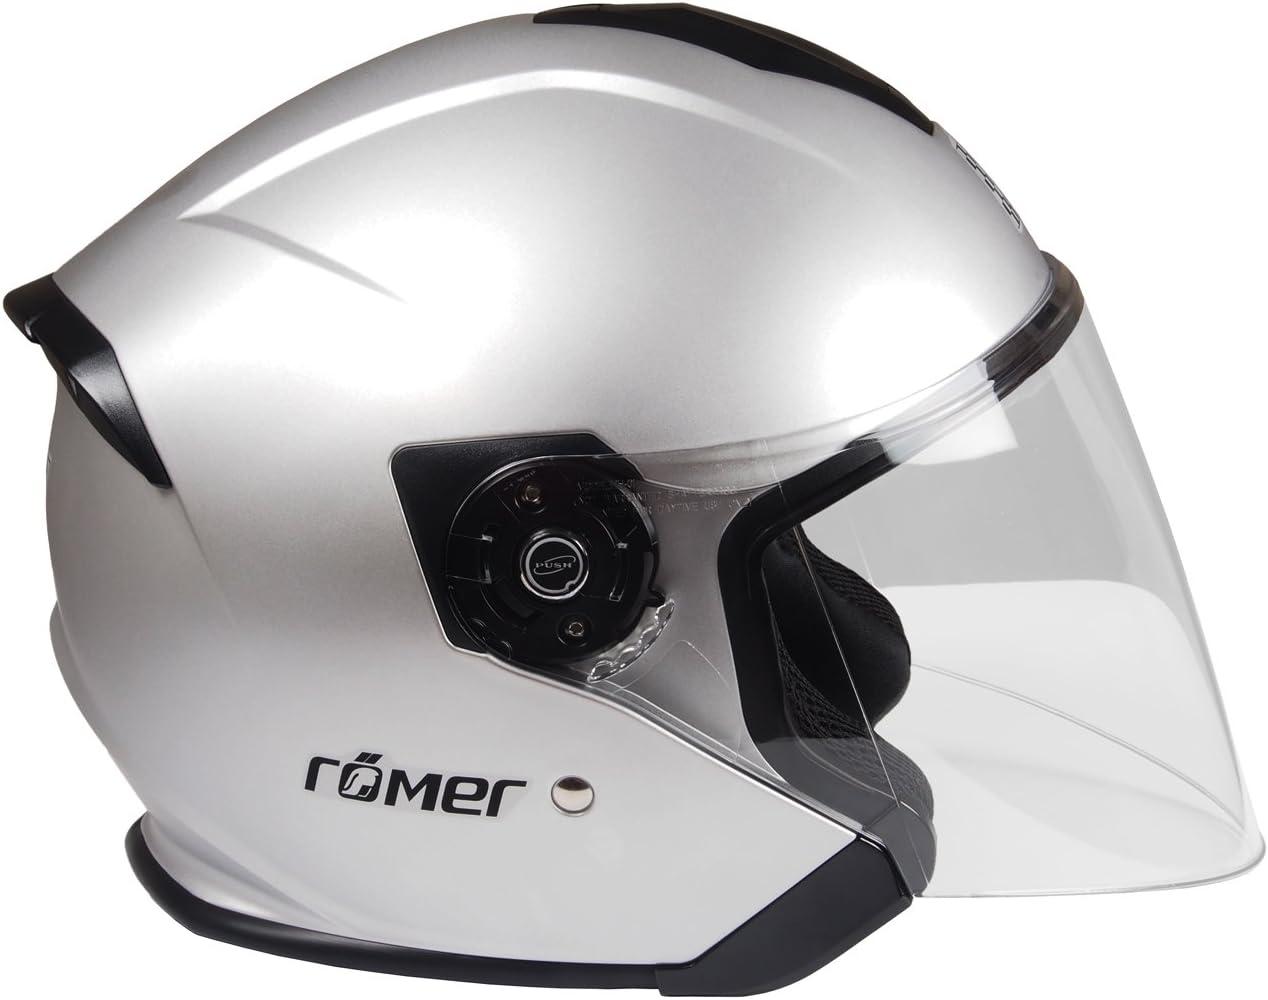 Silber Matt R/ömer Helmets Motorradhelm Koblenz Gr/ö/ße M